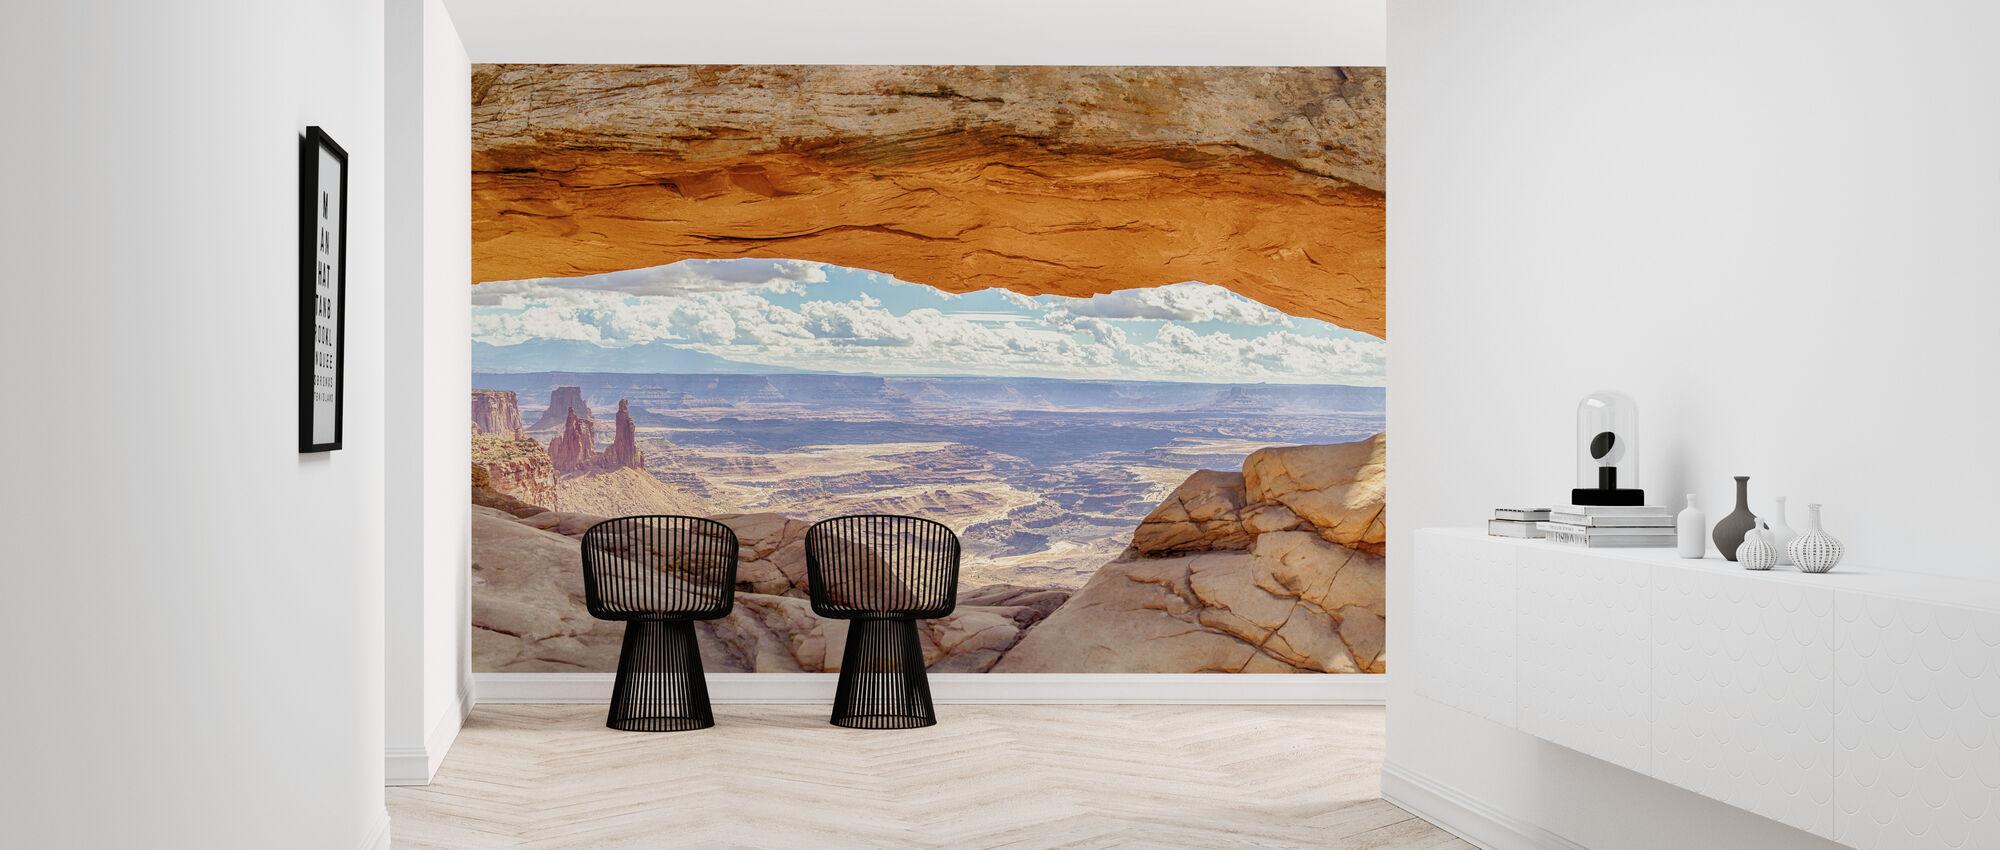 Mesa Arch at Sunrise - Wallpaper - Hallway